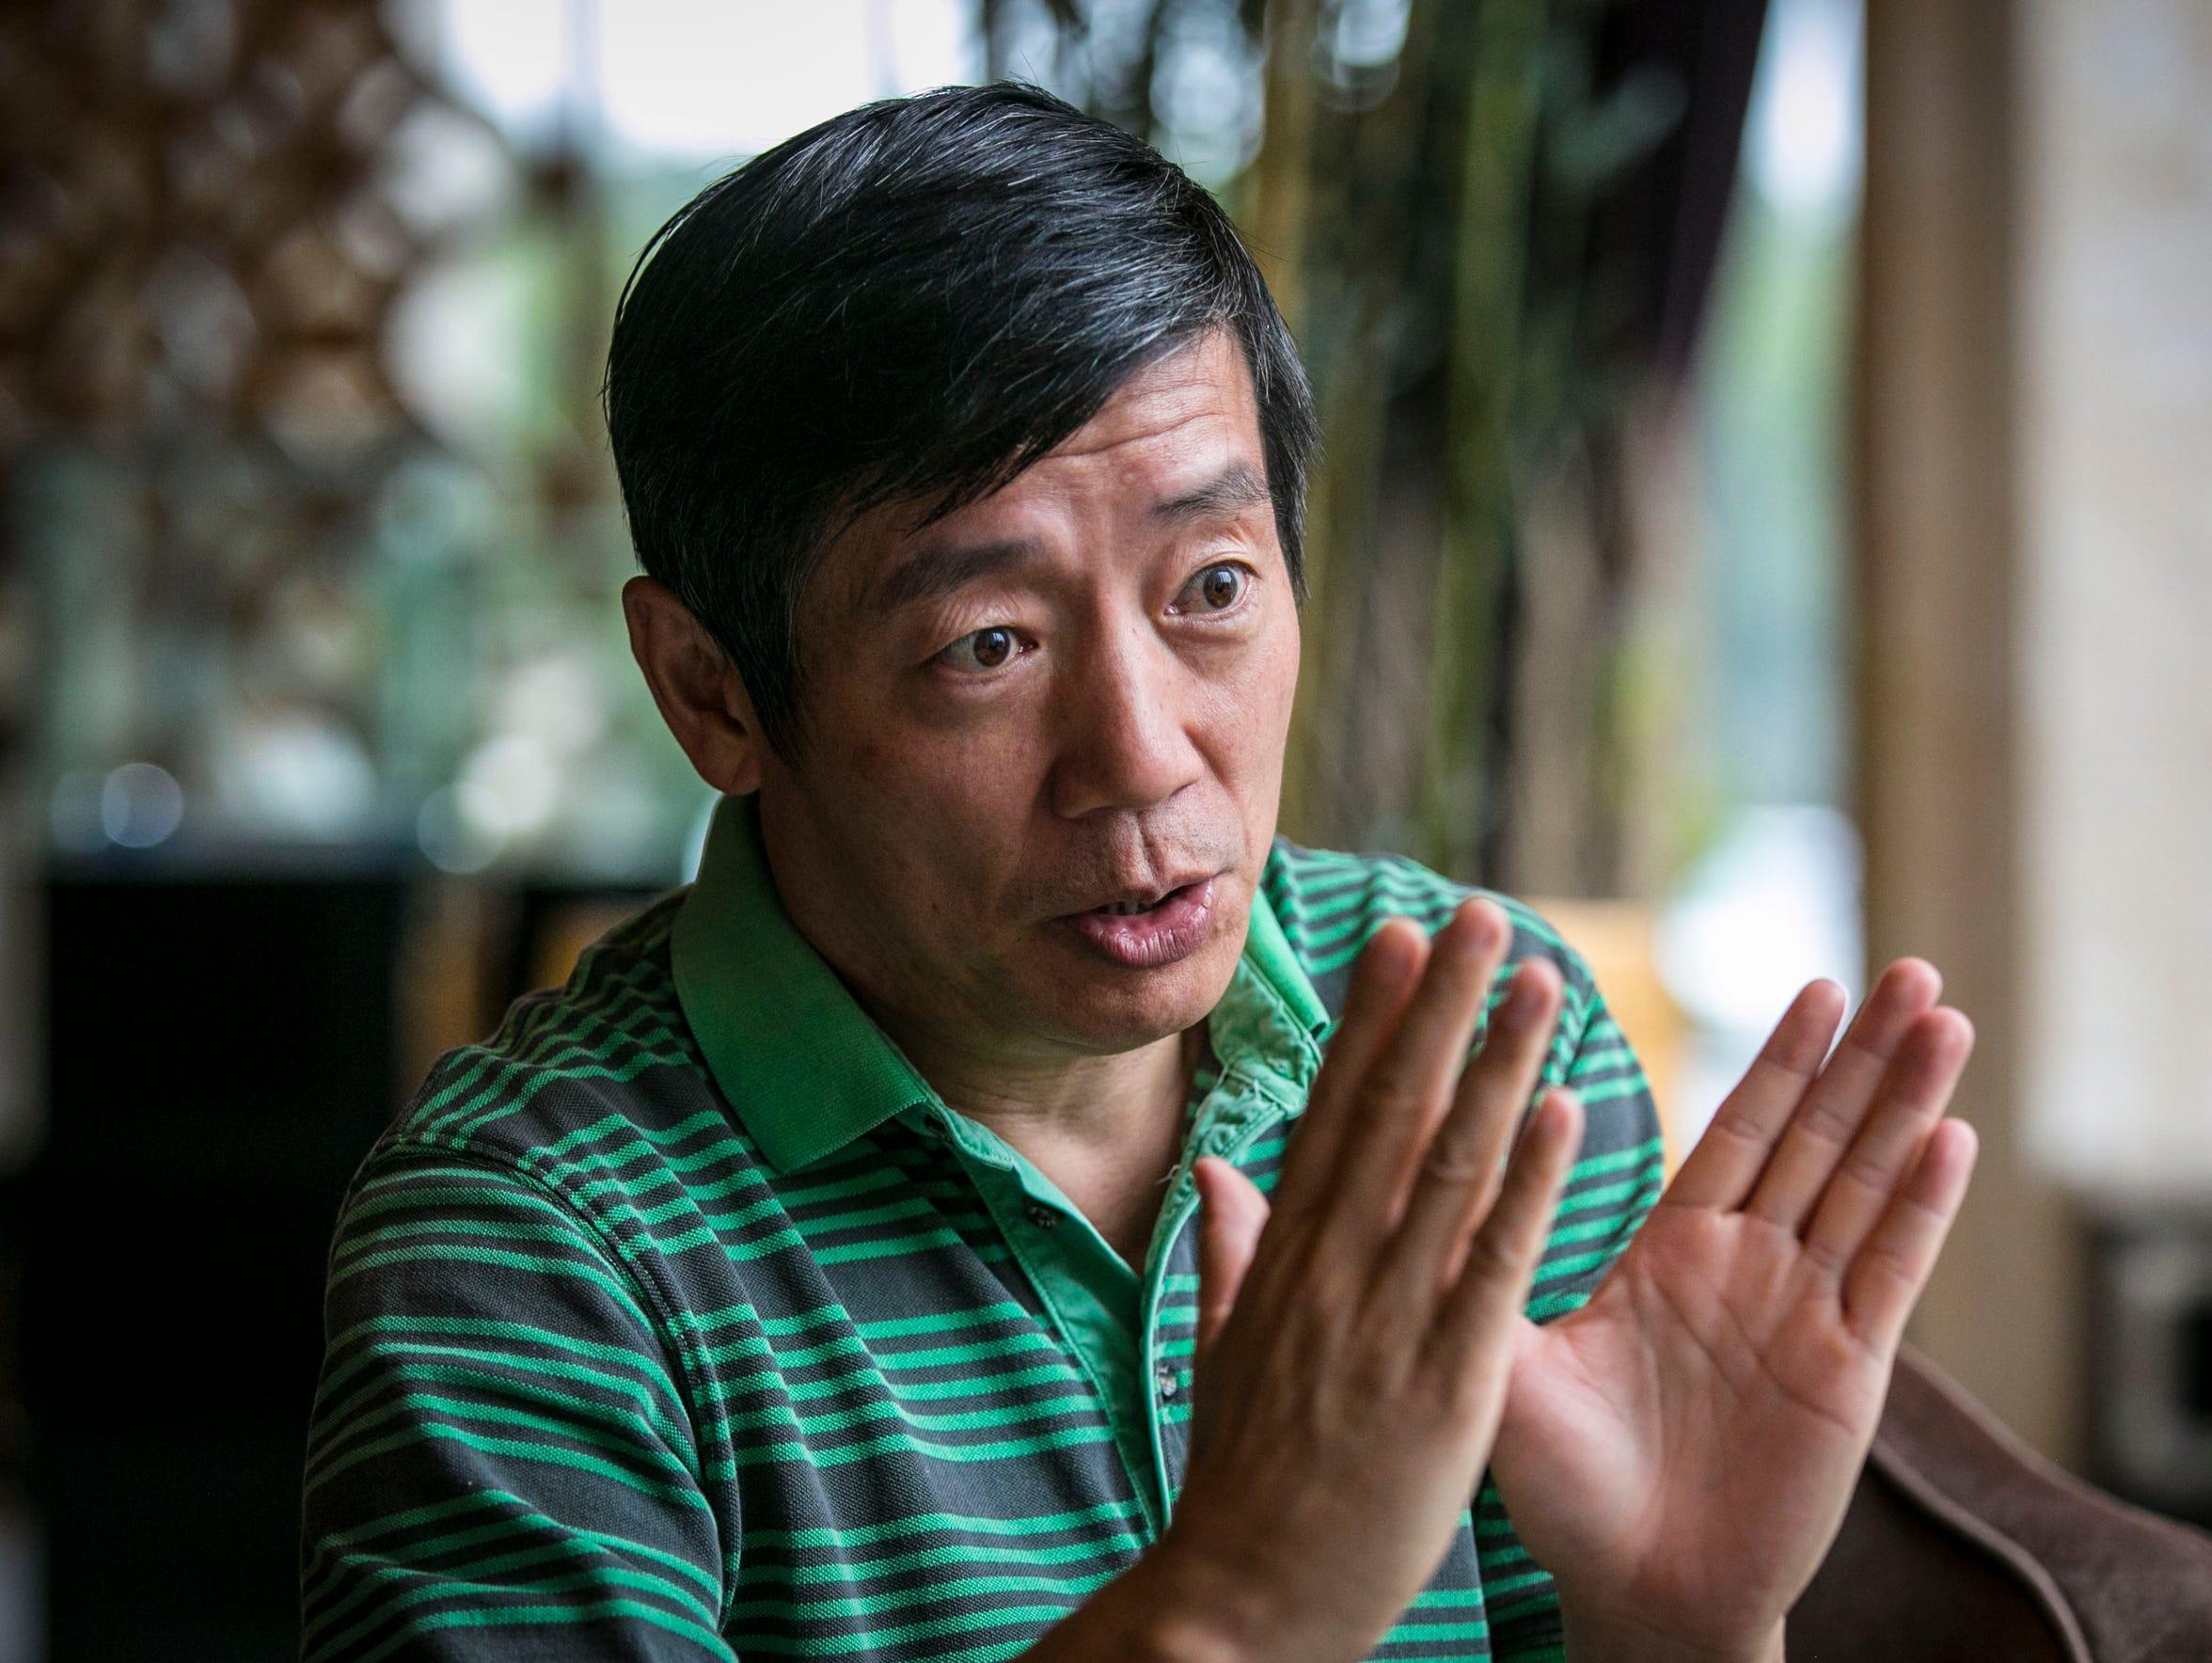 David Liu runs Gansu Hengji Seed Co. and is helping